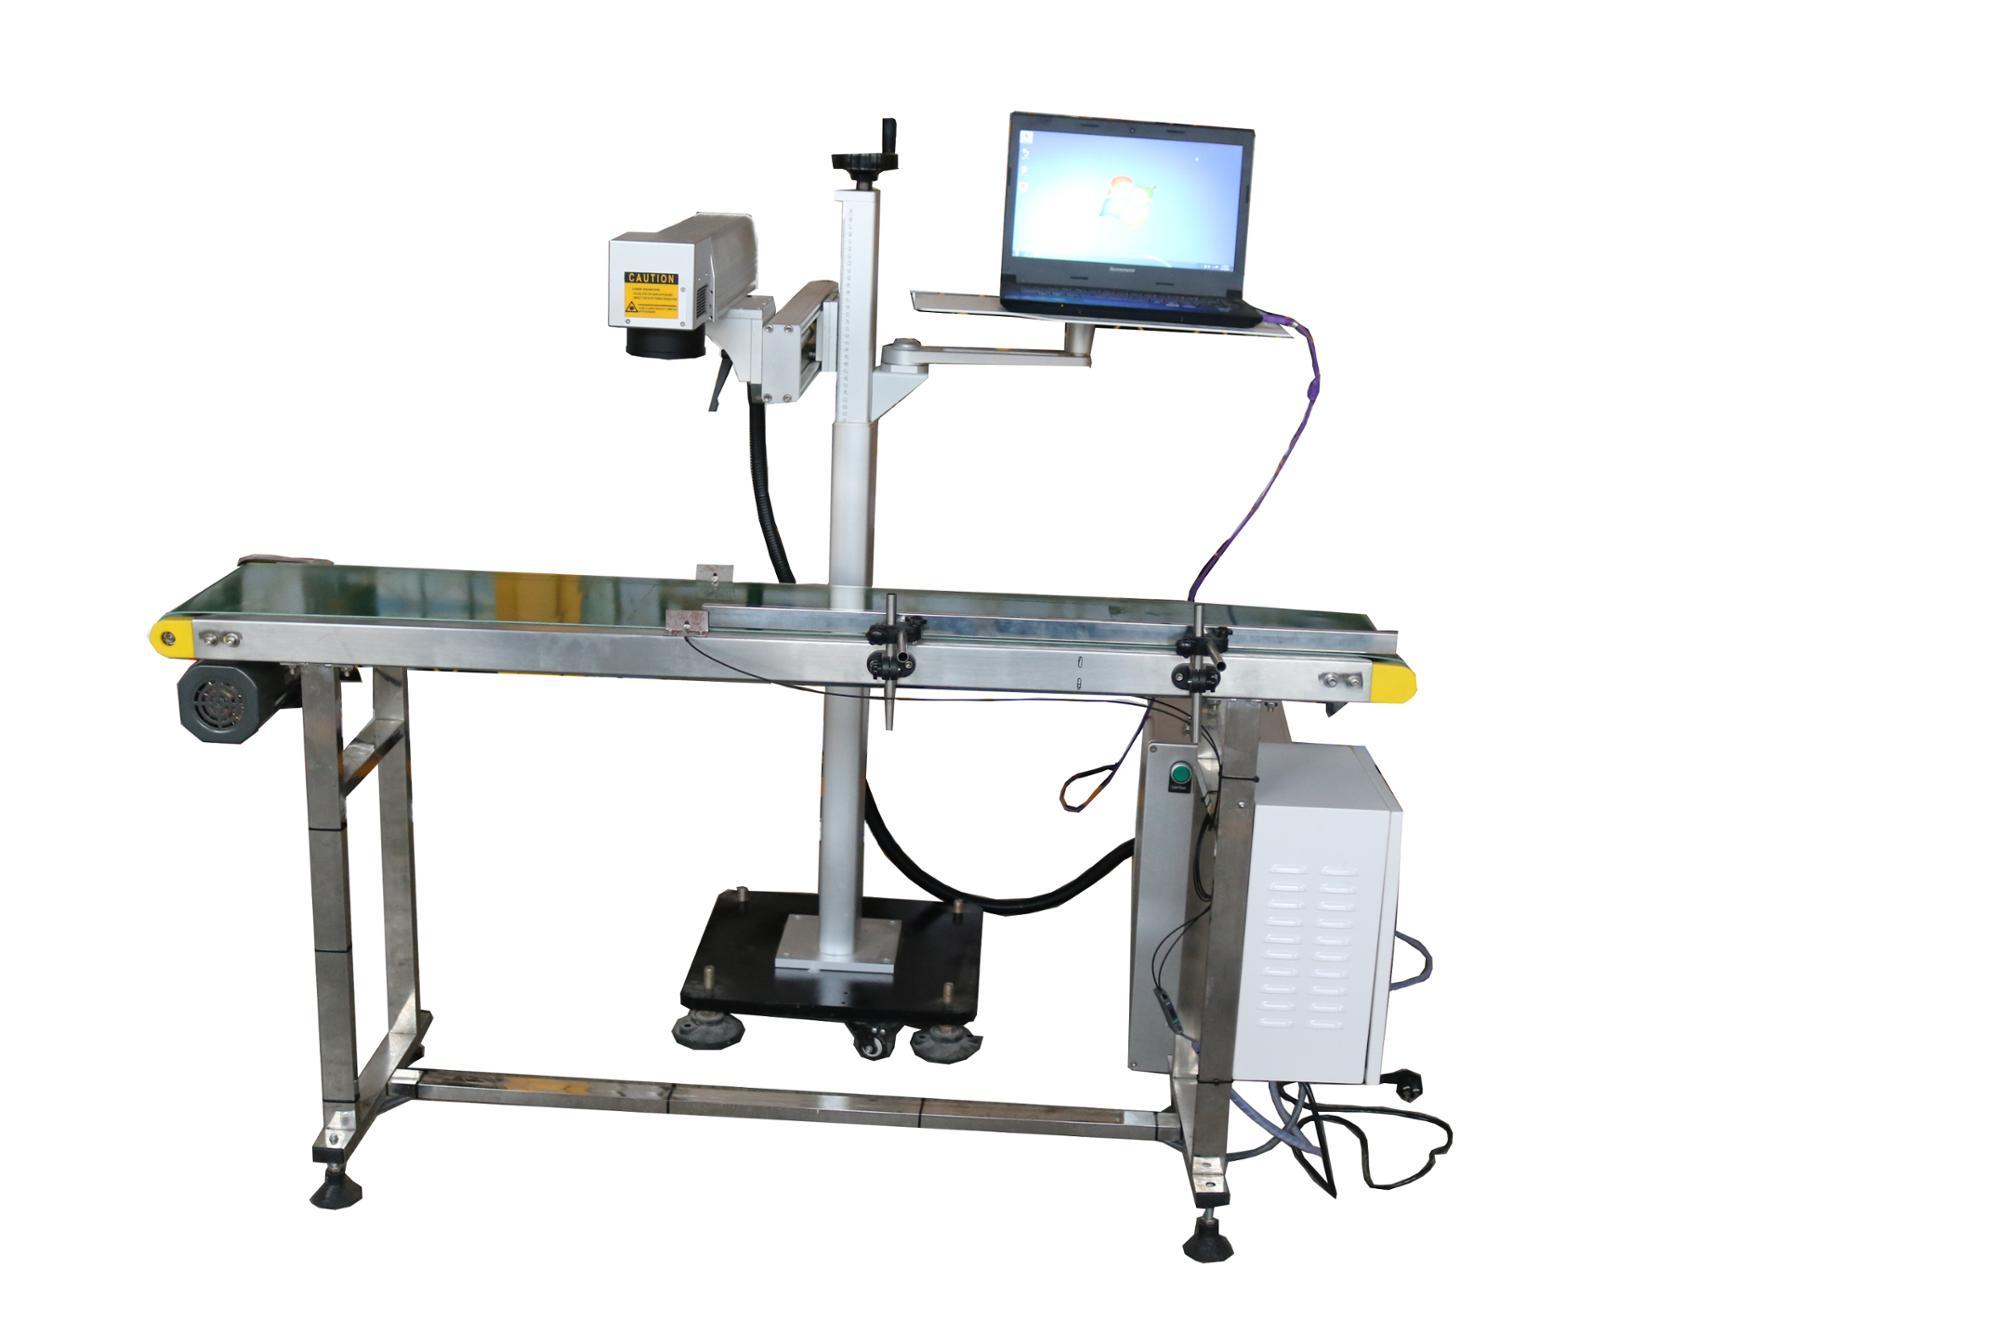 Fluenct fiber laser marking system LXF-20W 30w conveyor belt laser marking  machine, View fiber laser marking system LXF-20W 30w, JNLINK Product